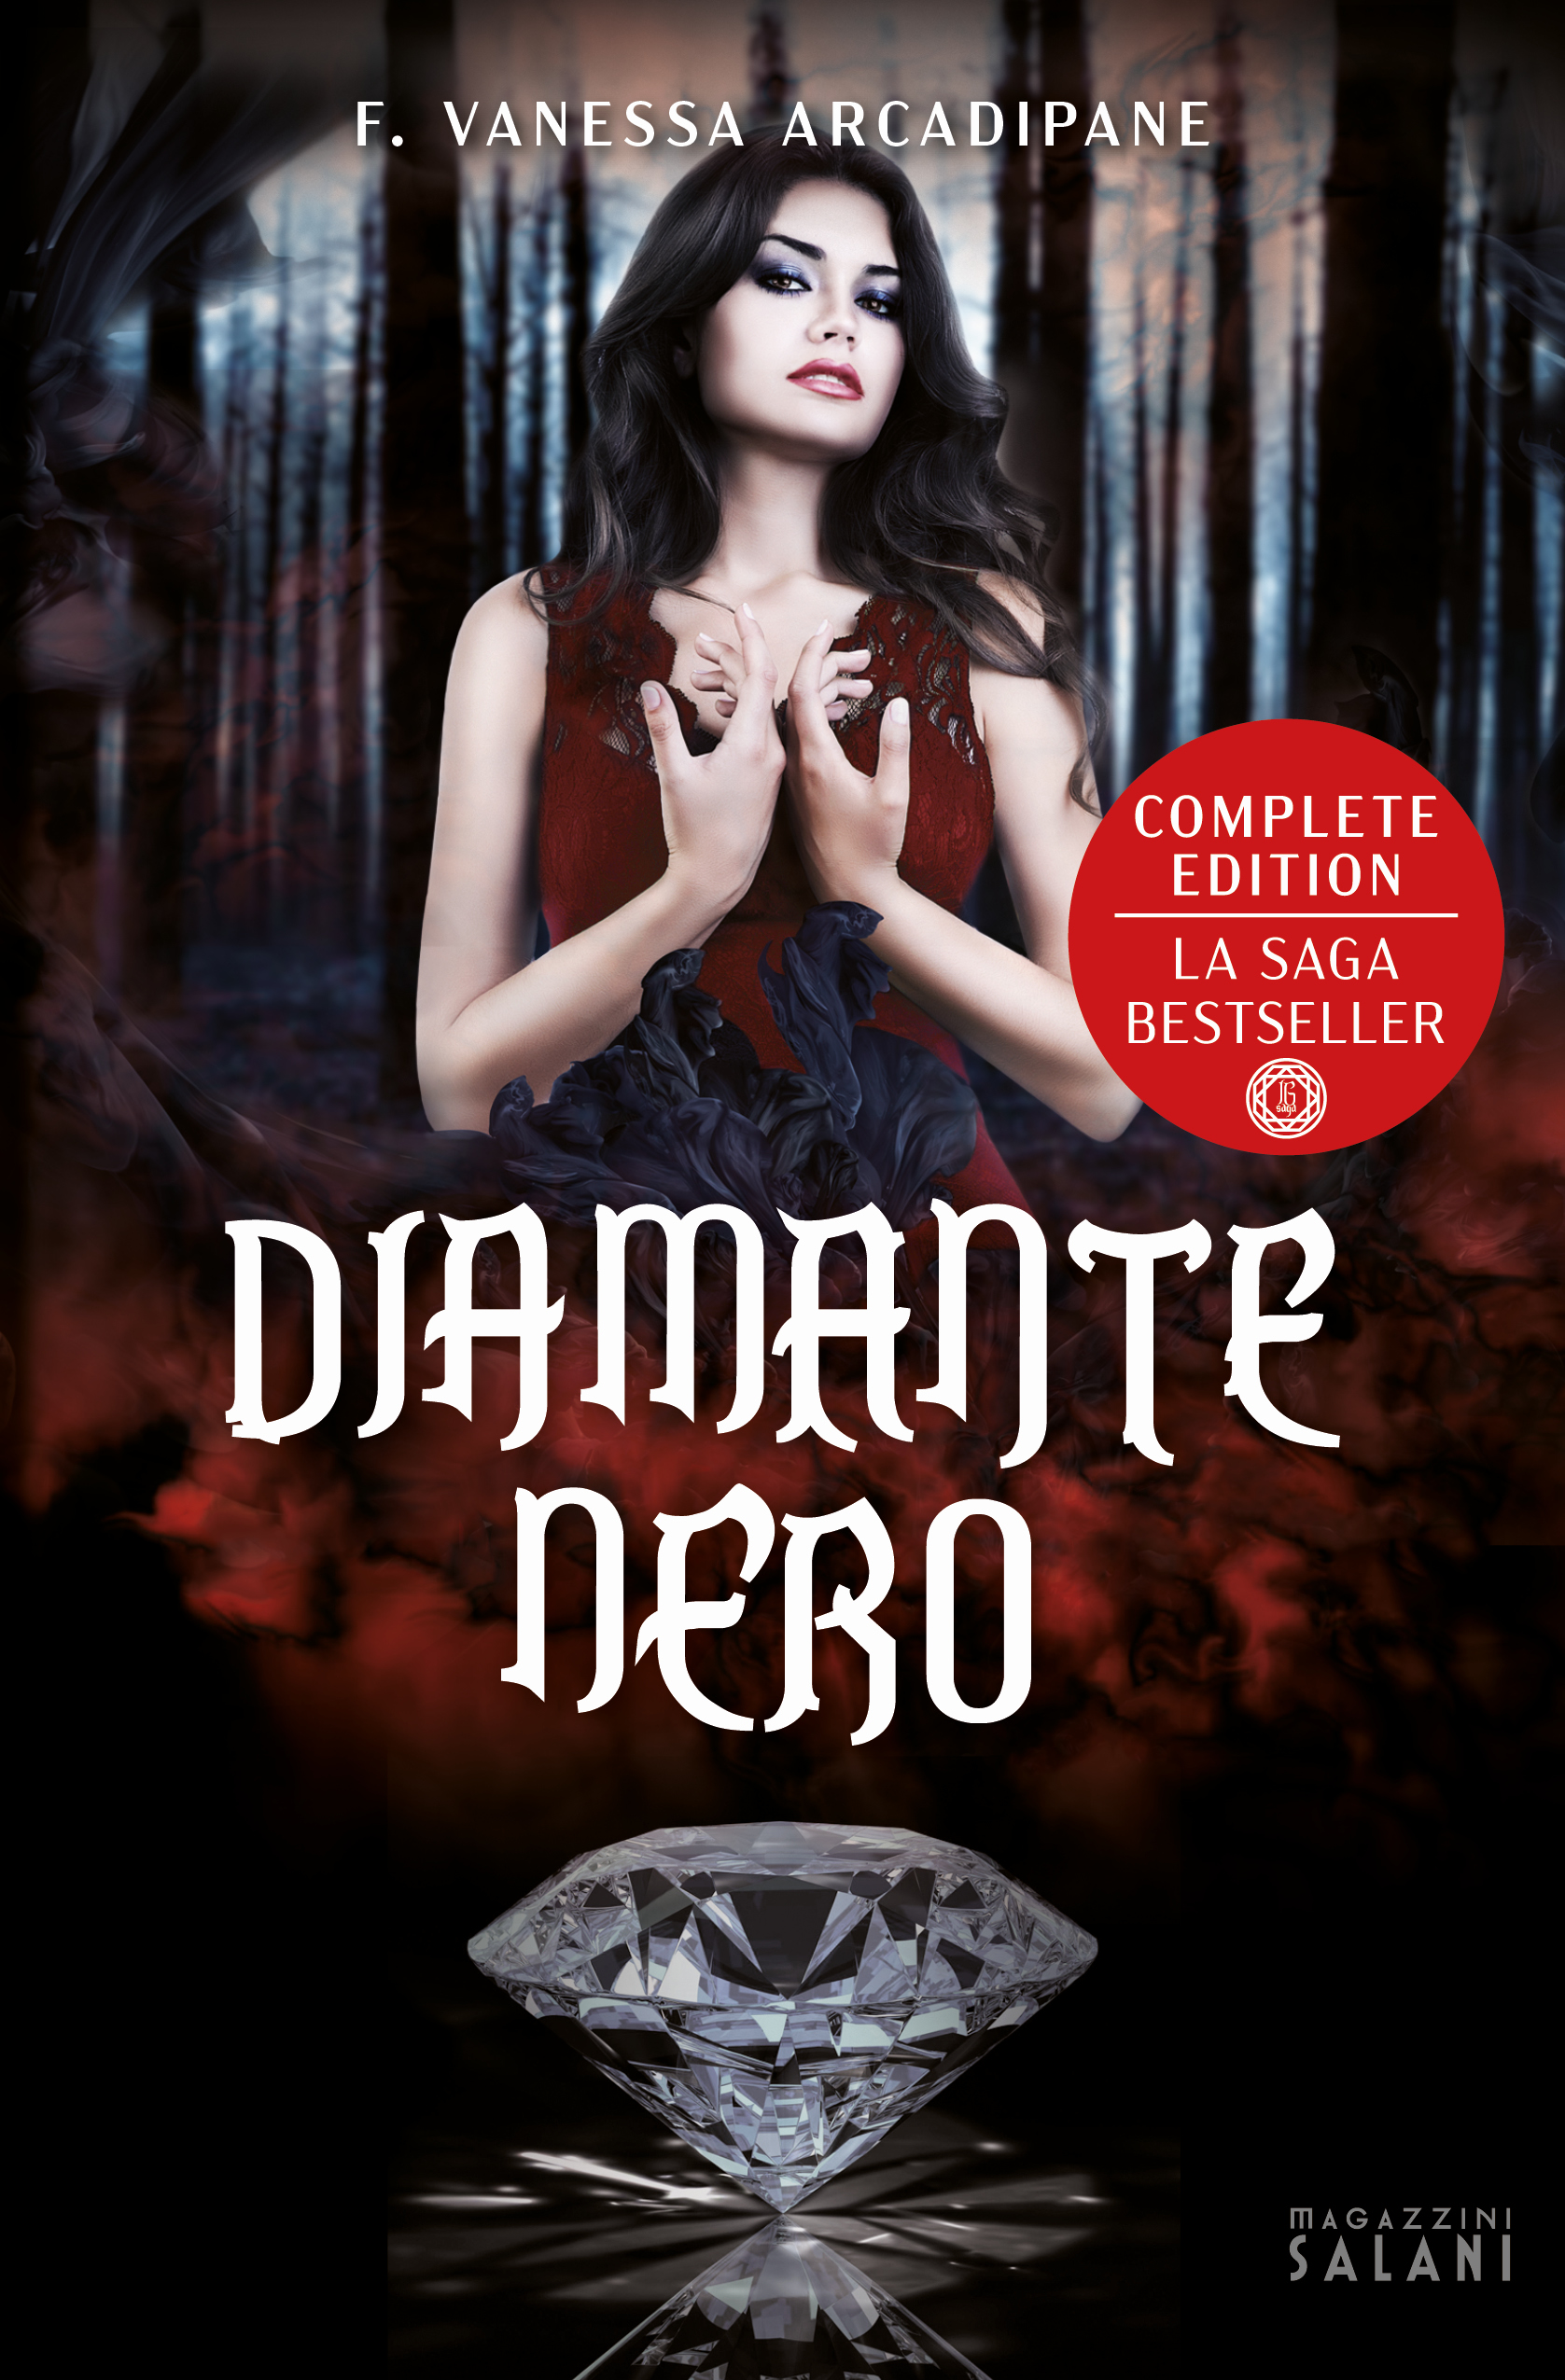 arcadipane_diamante_nero_cover